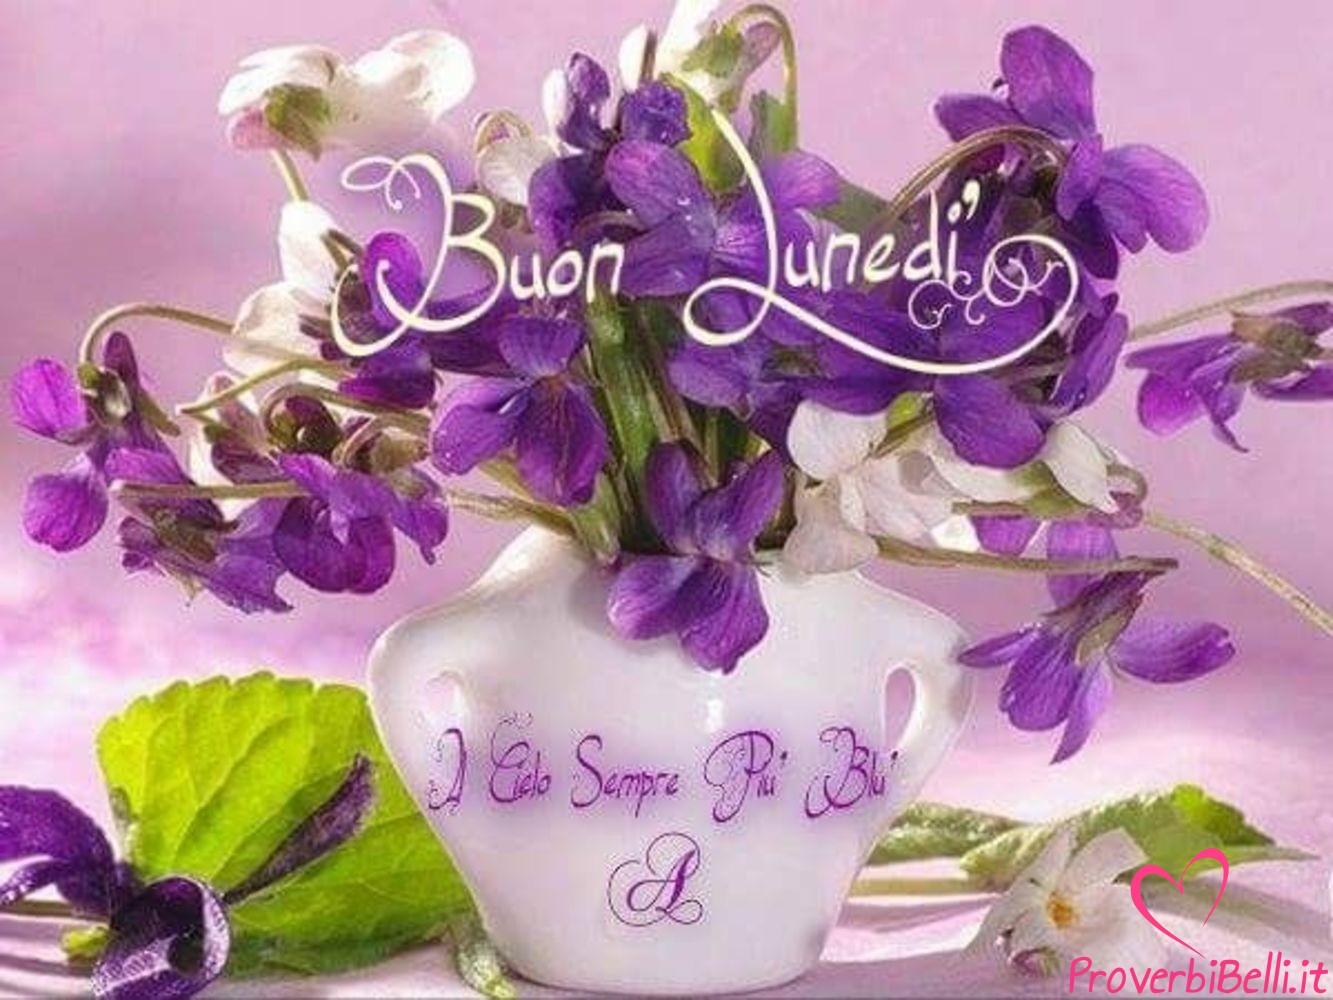 Lunedì-Immagini-belle-whatsapp-572